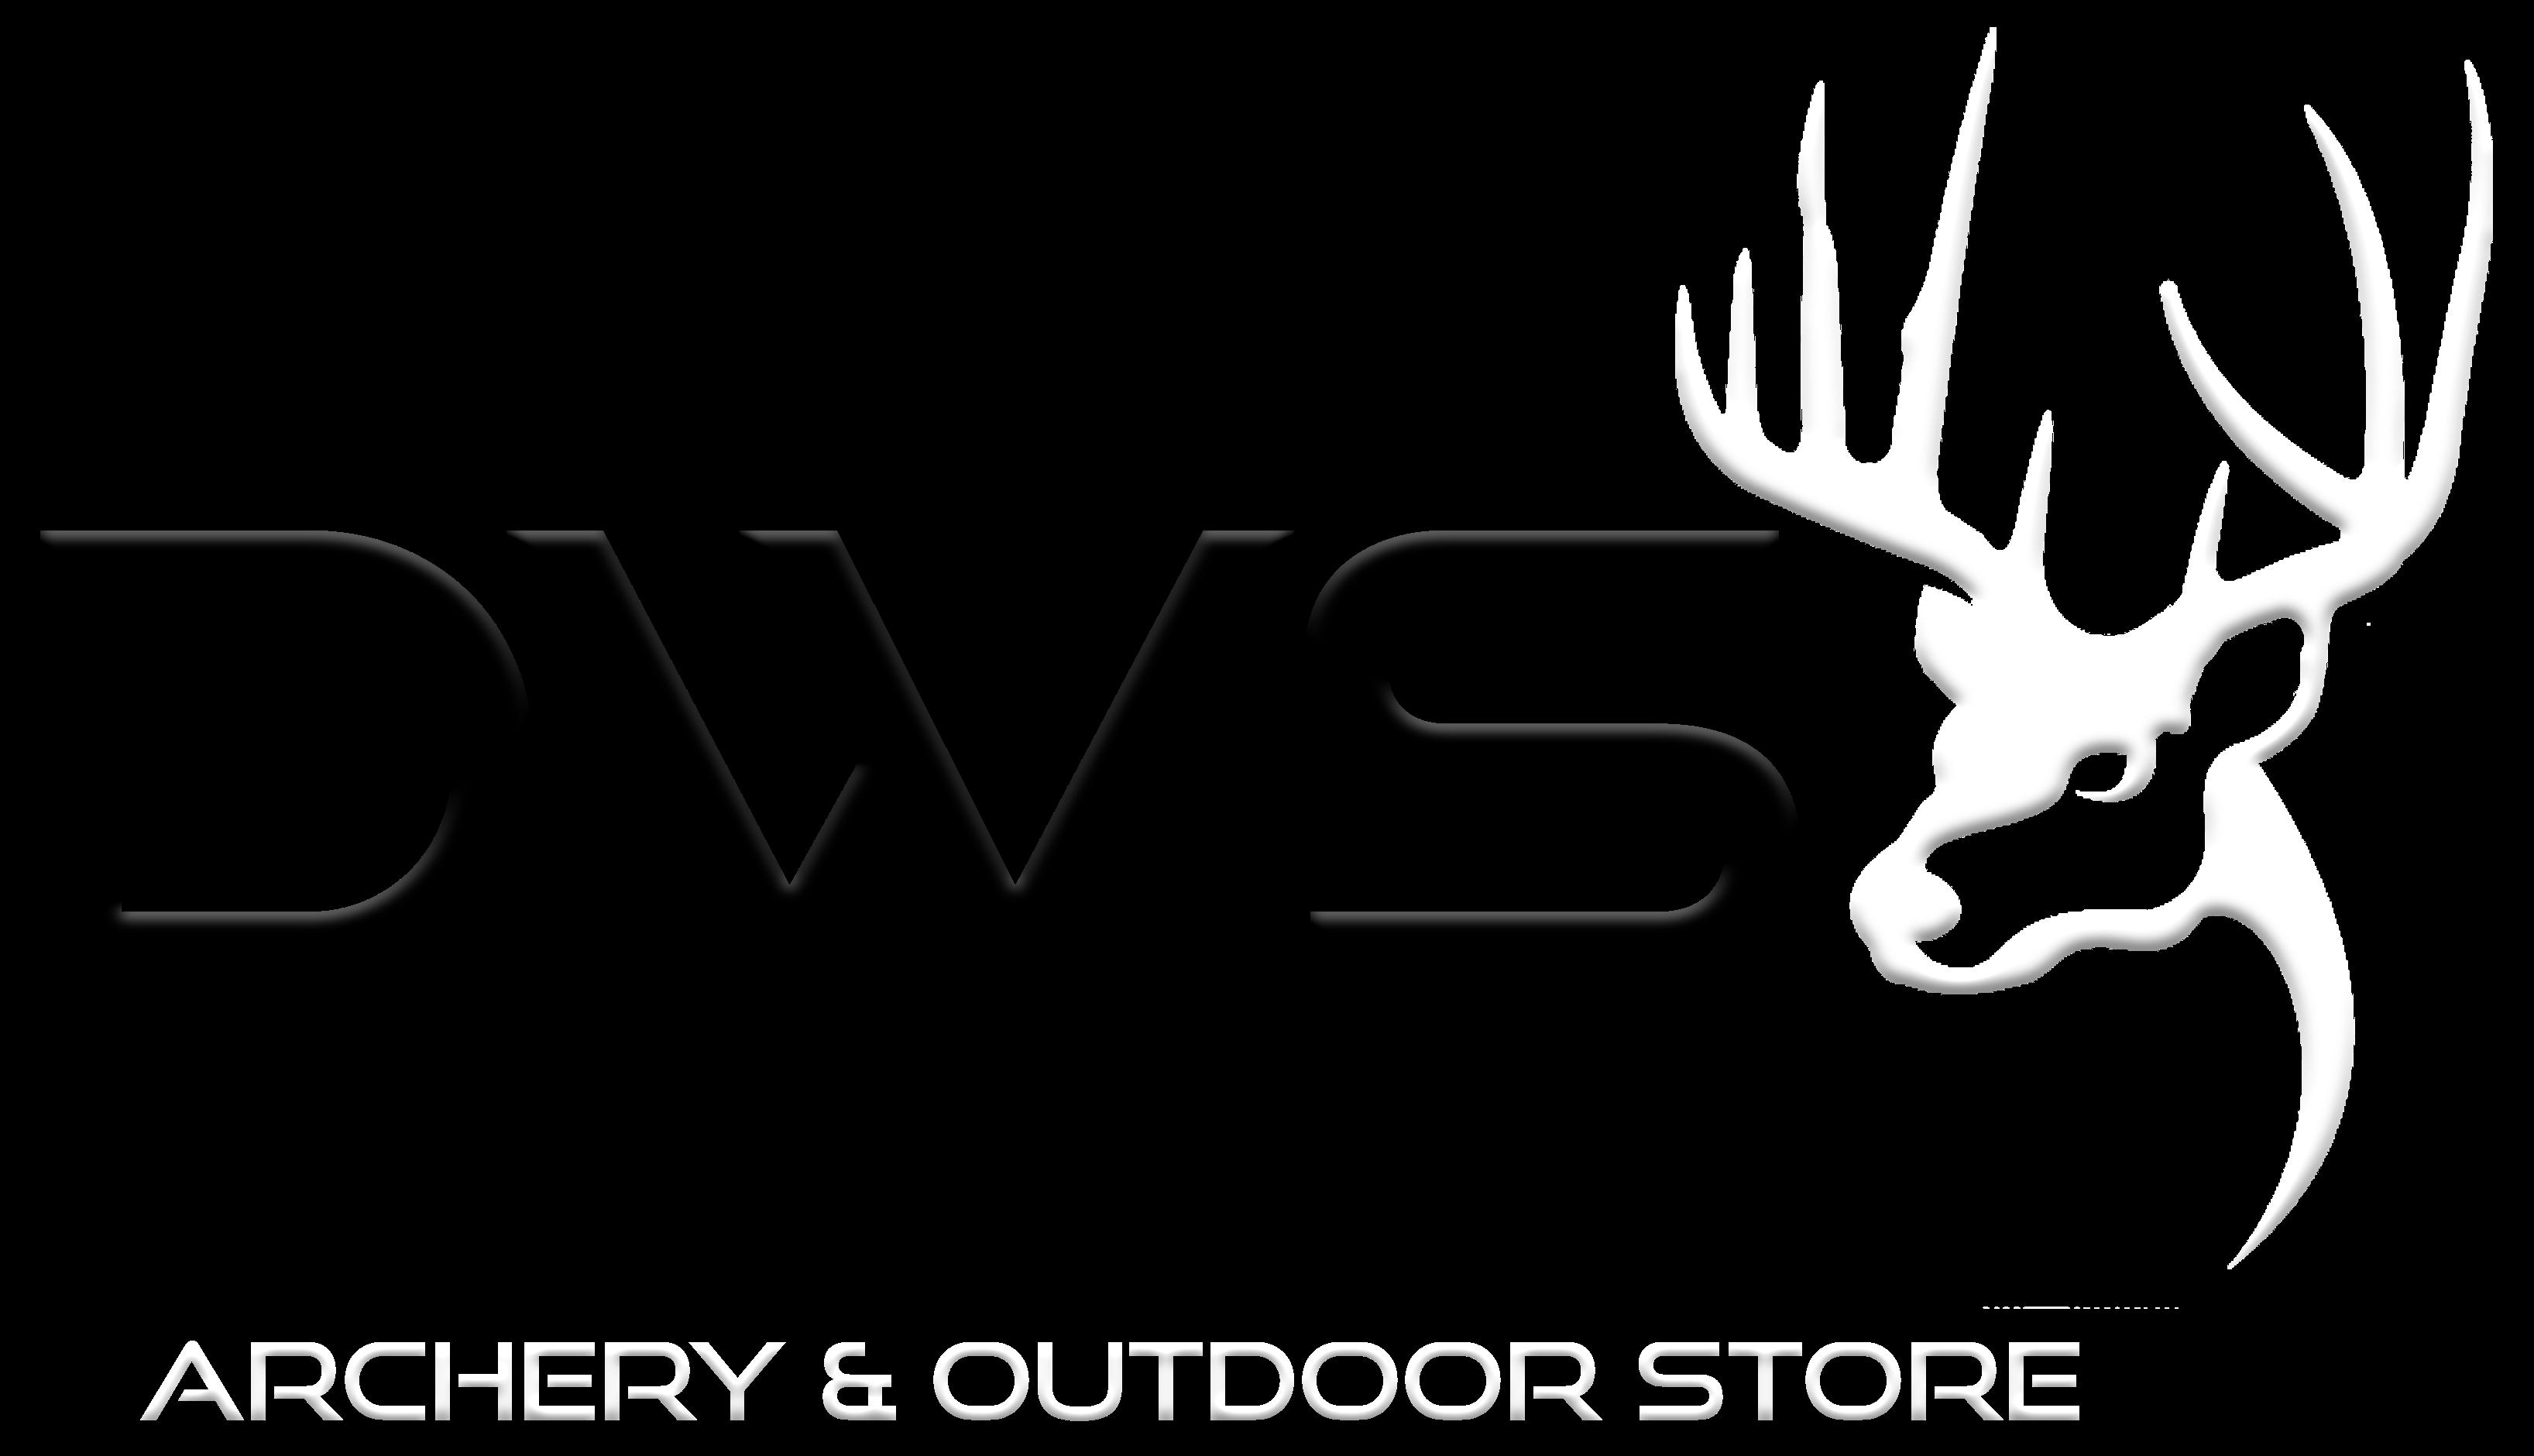 DWS Outdoors